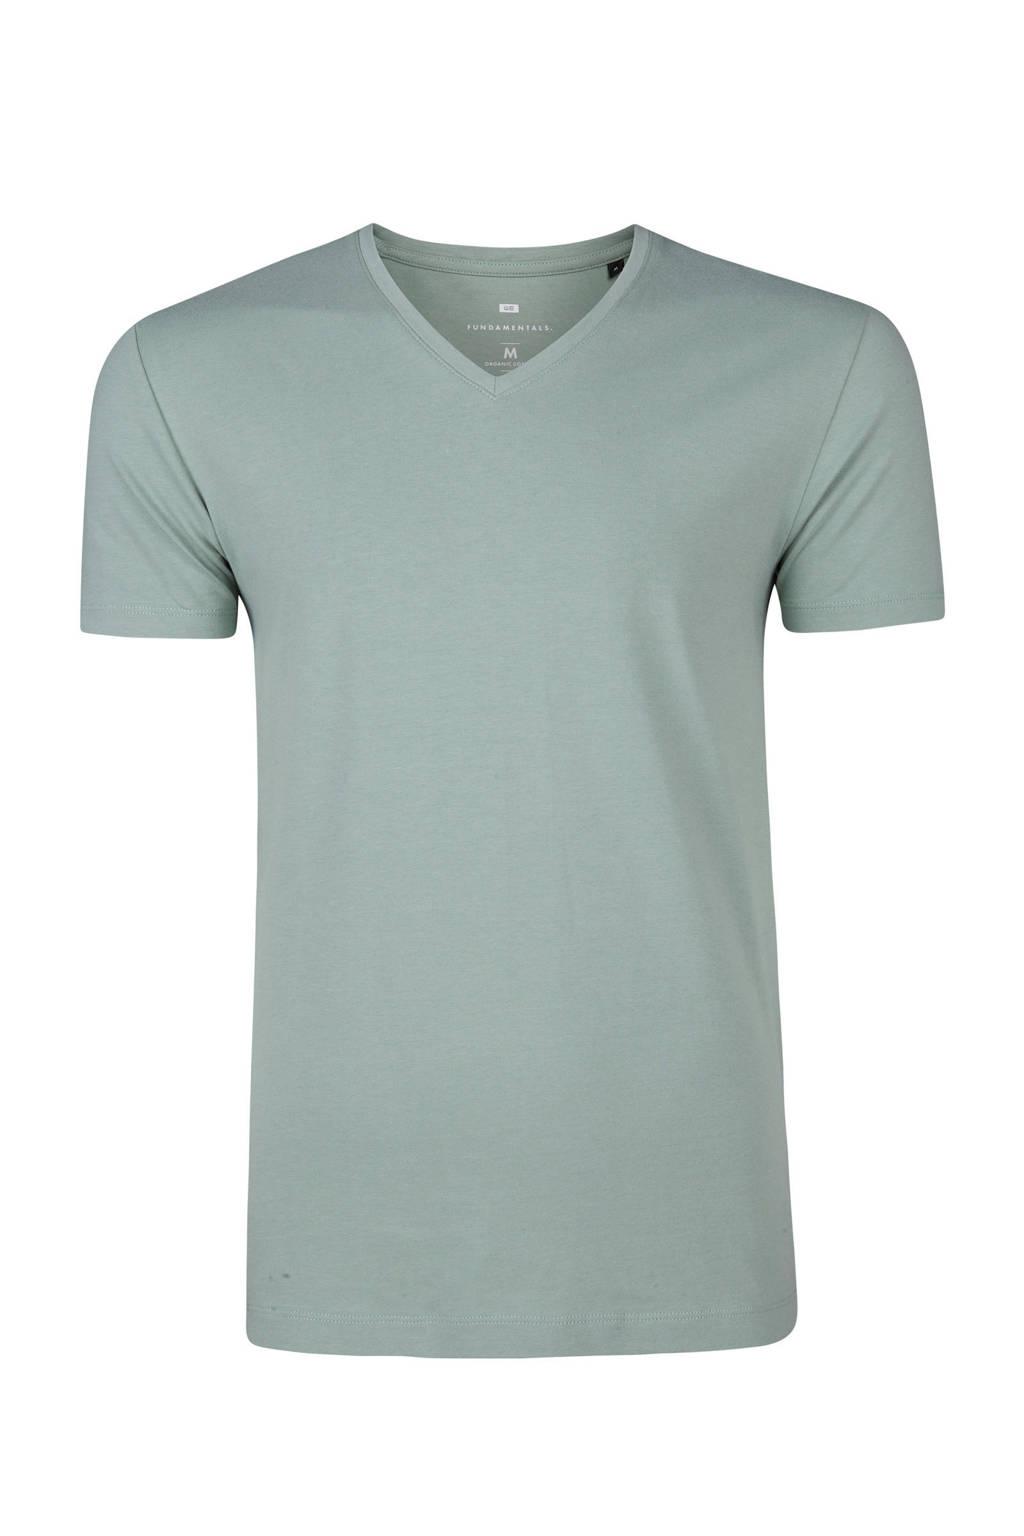 WE Fashion Fundamental slim fit T-shirt, Groen